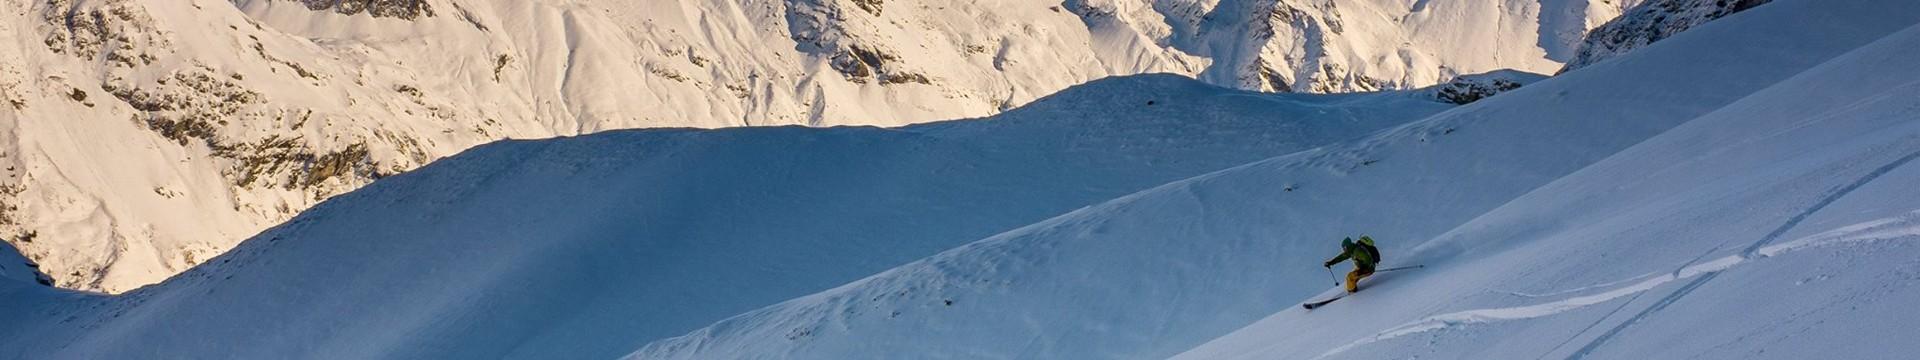 ski-08-8777